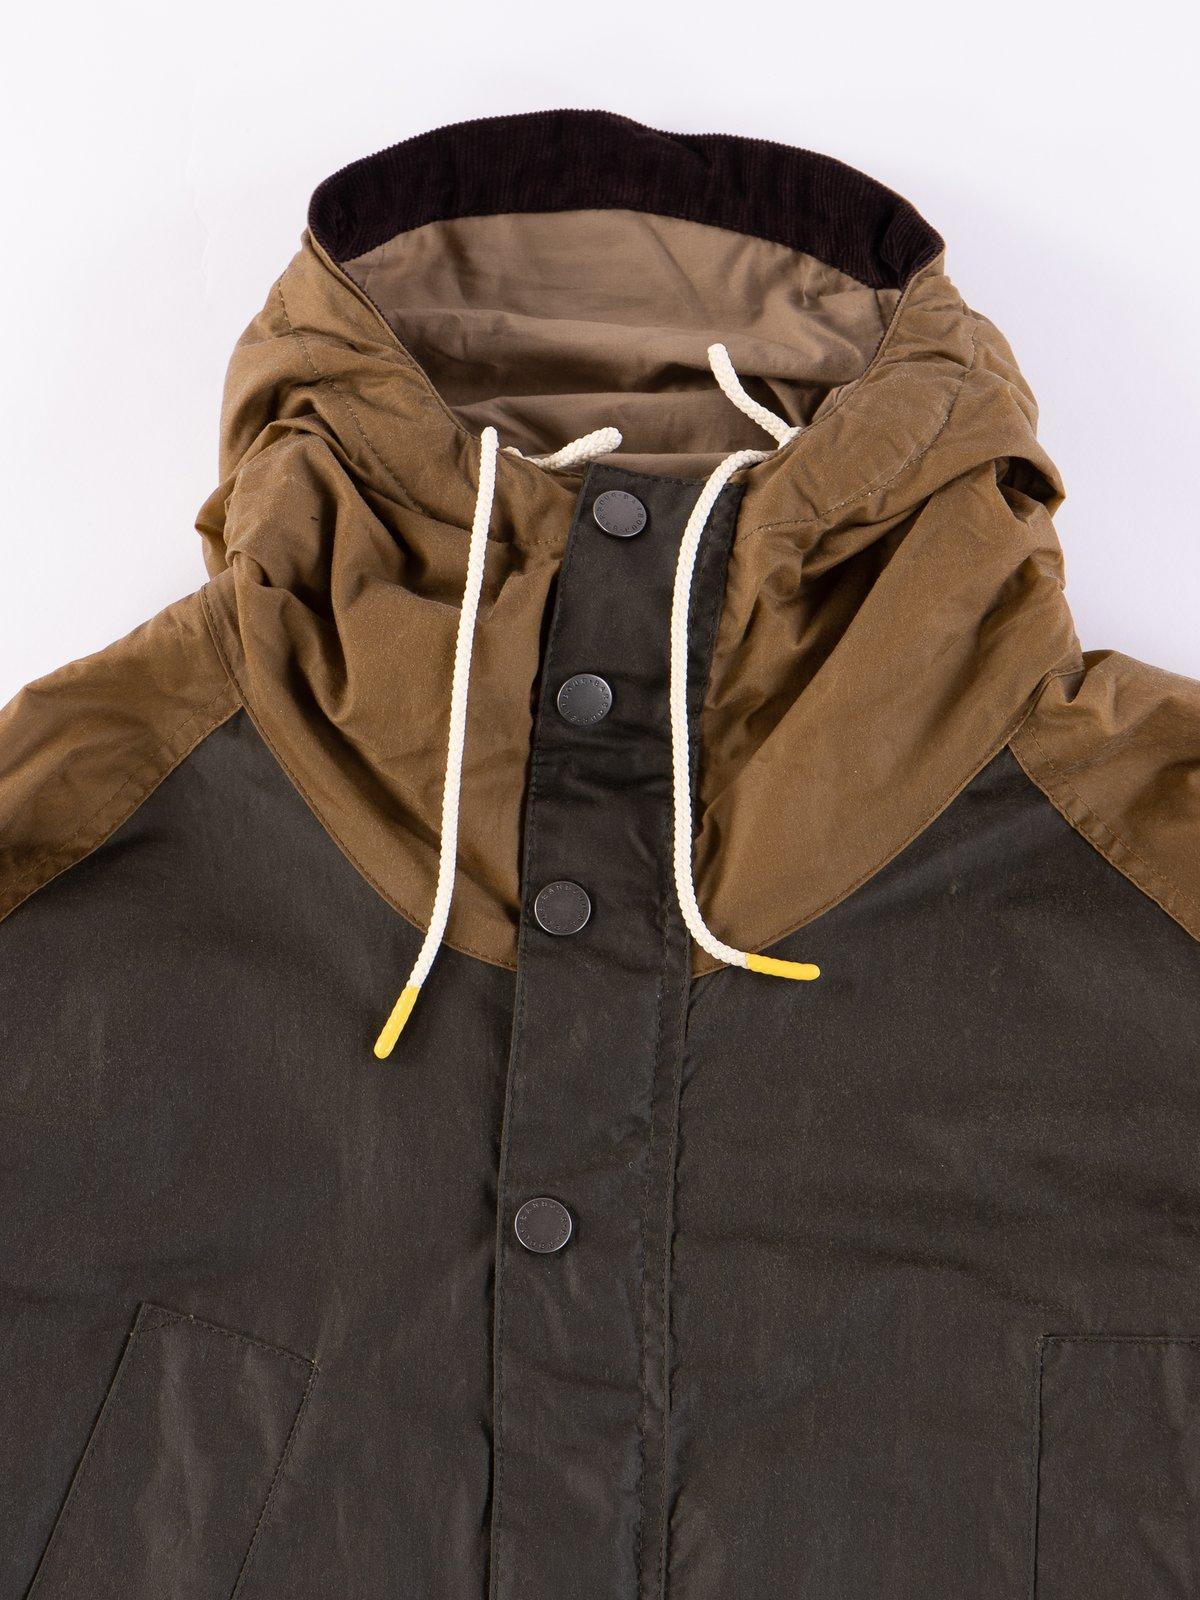 Multi Whitworth Wax Jacket - Image 3